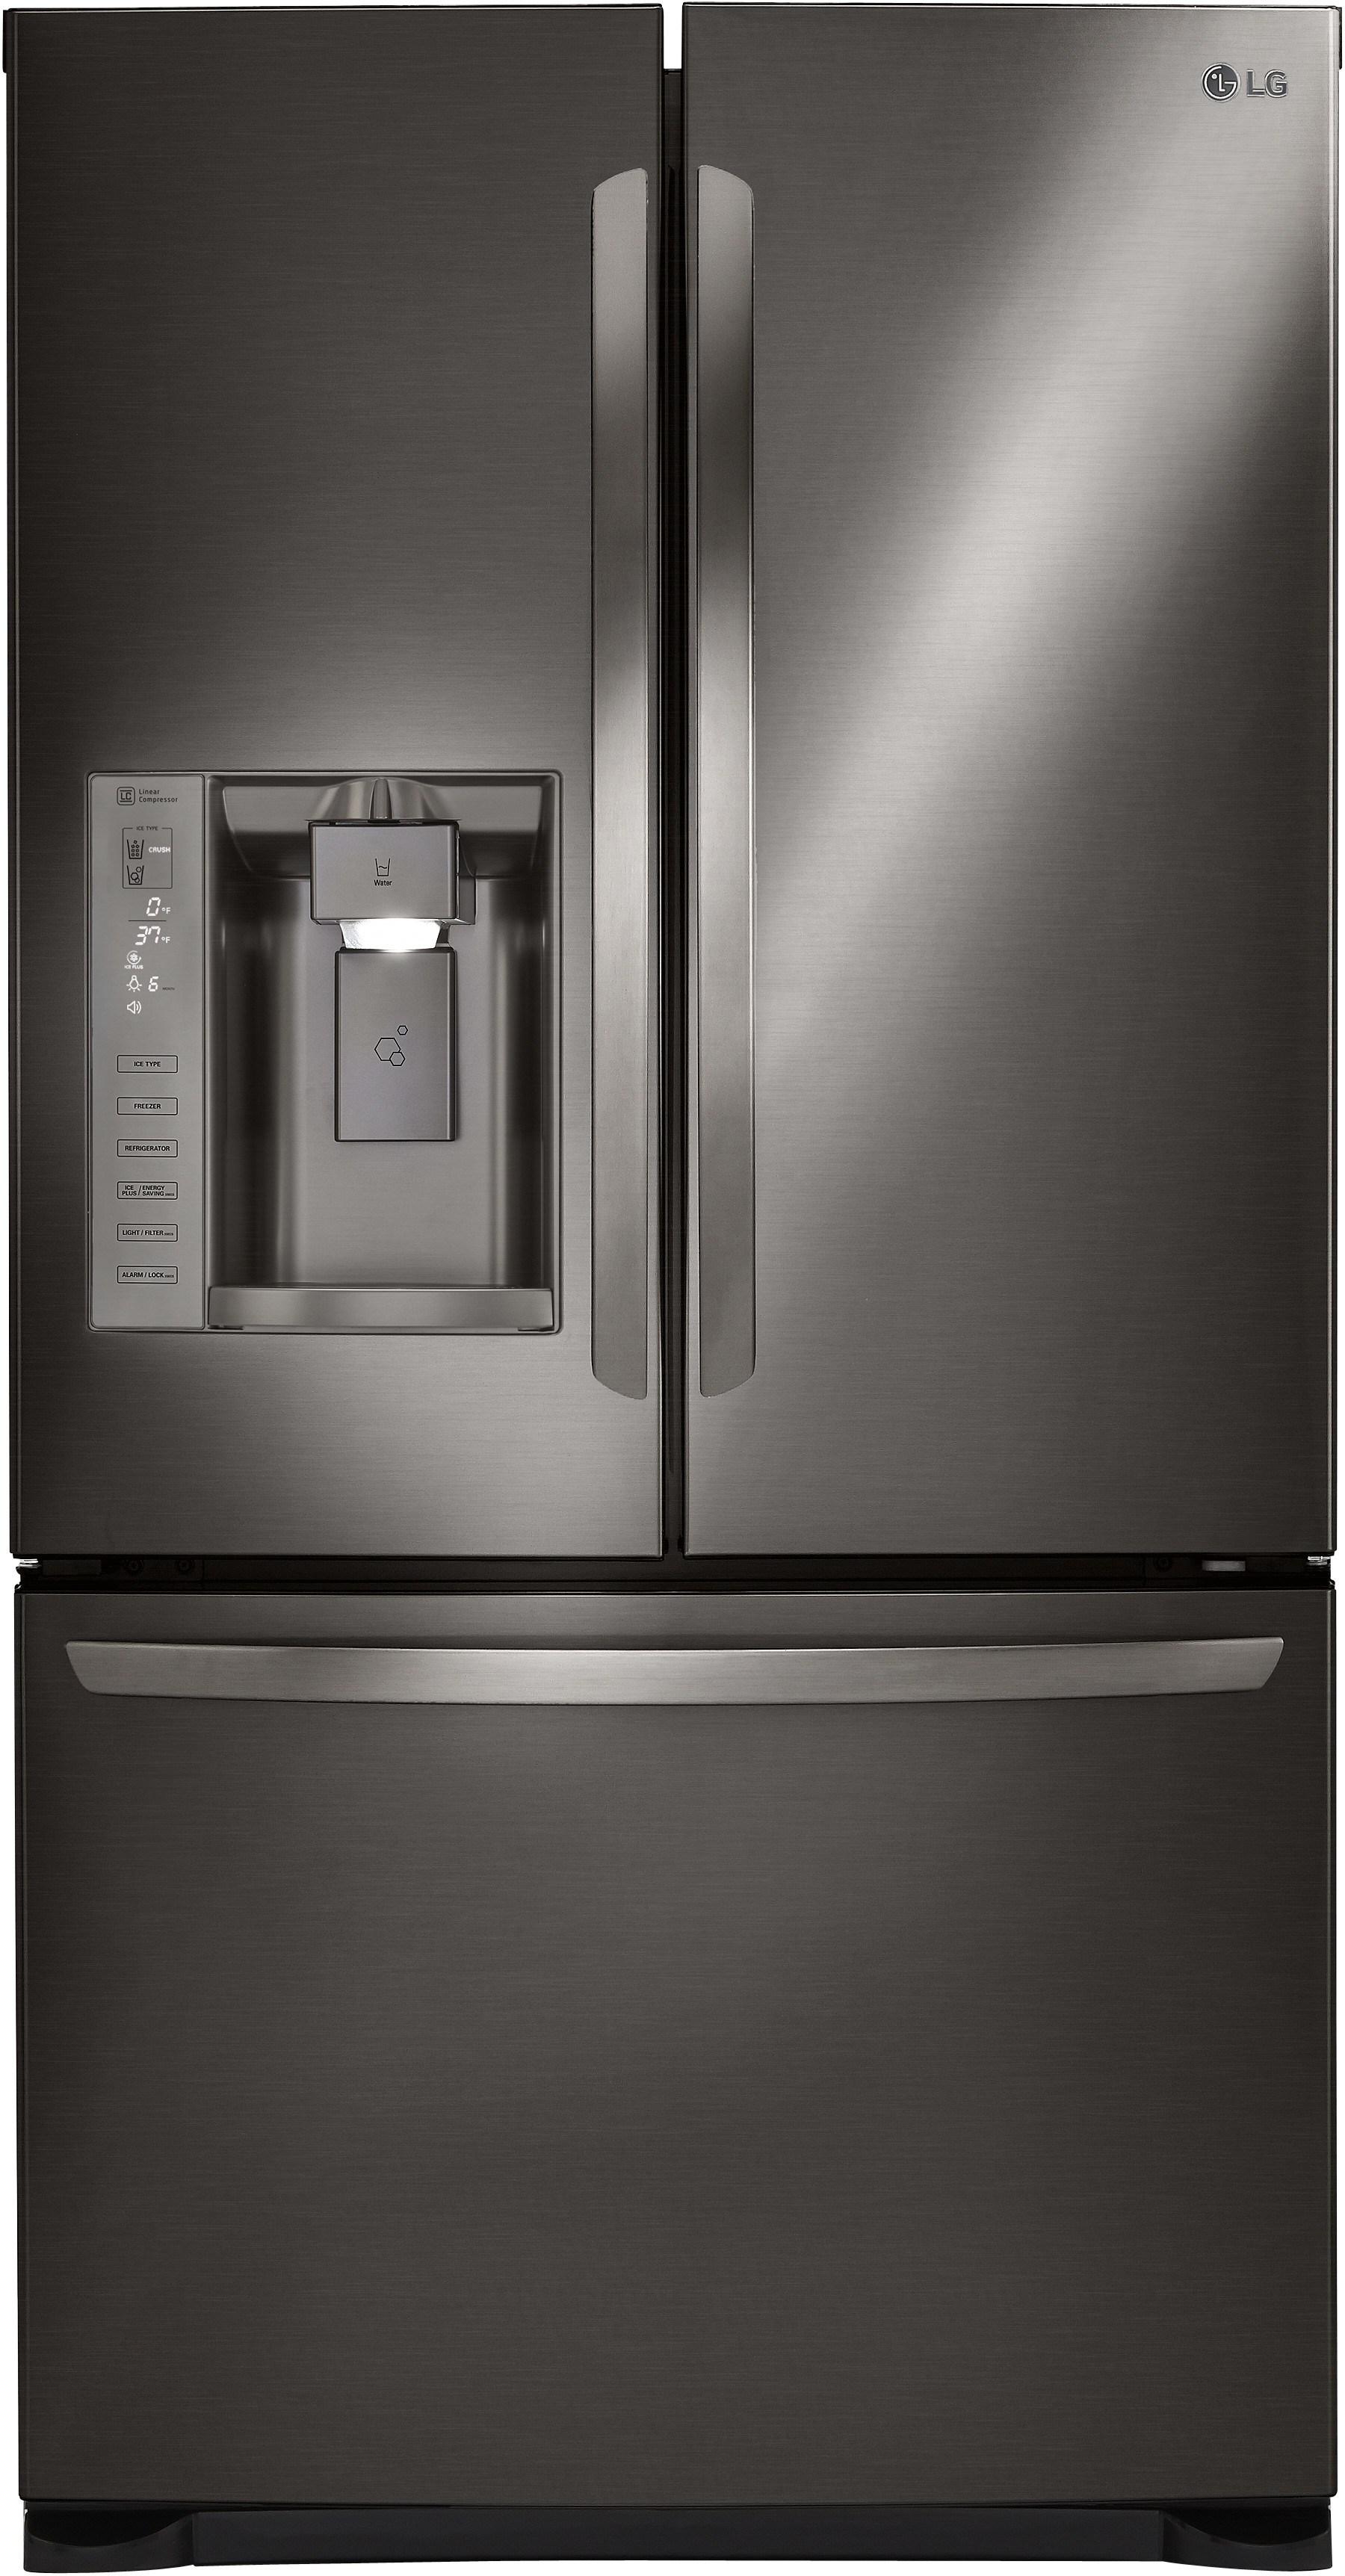 Lg Lfx25973d 36 Inch French Door Refrigerator With Slim